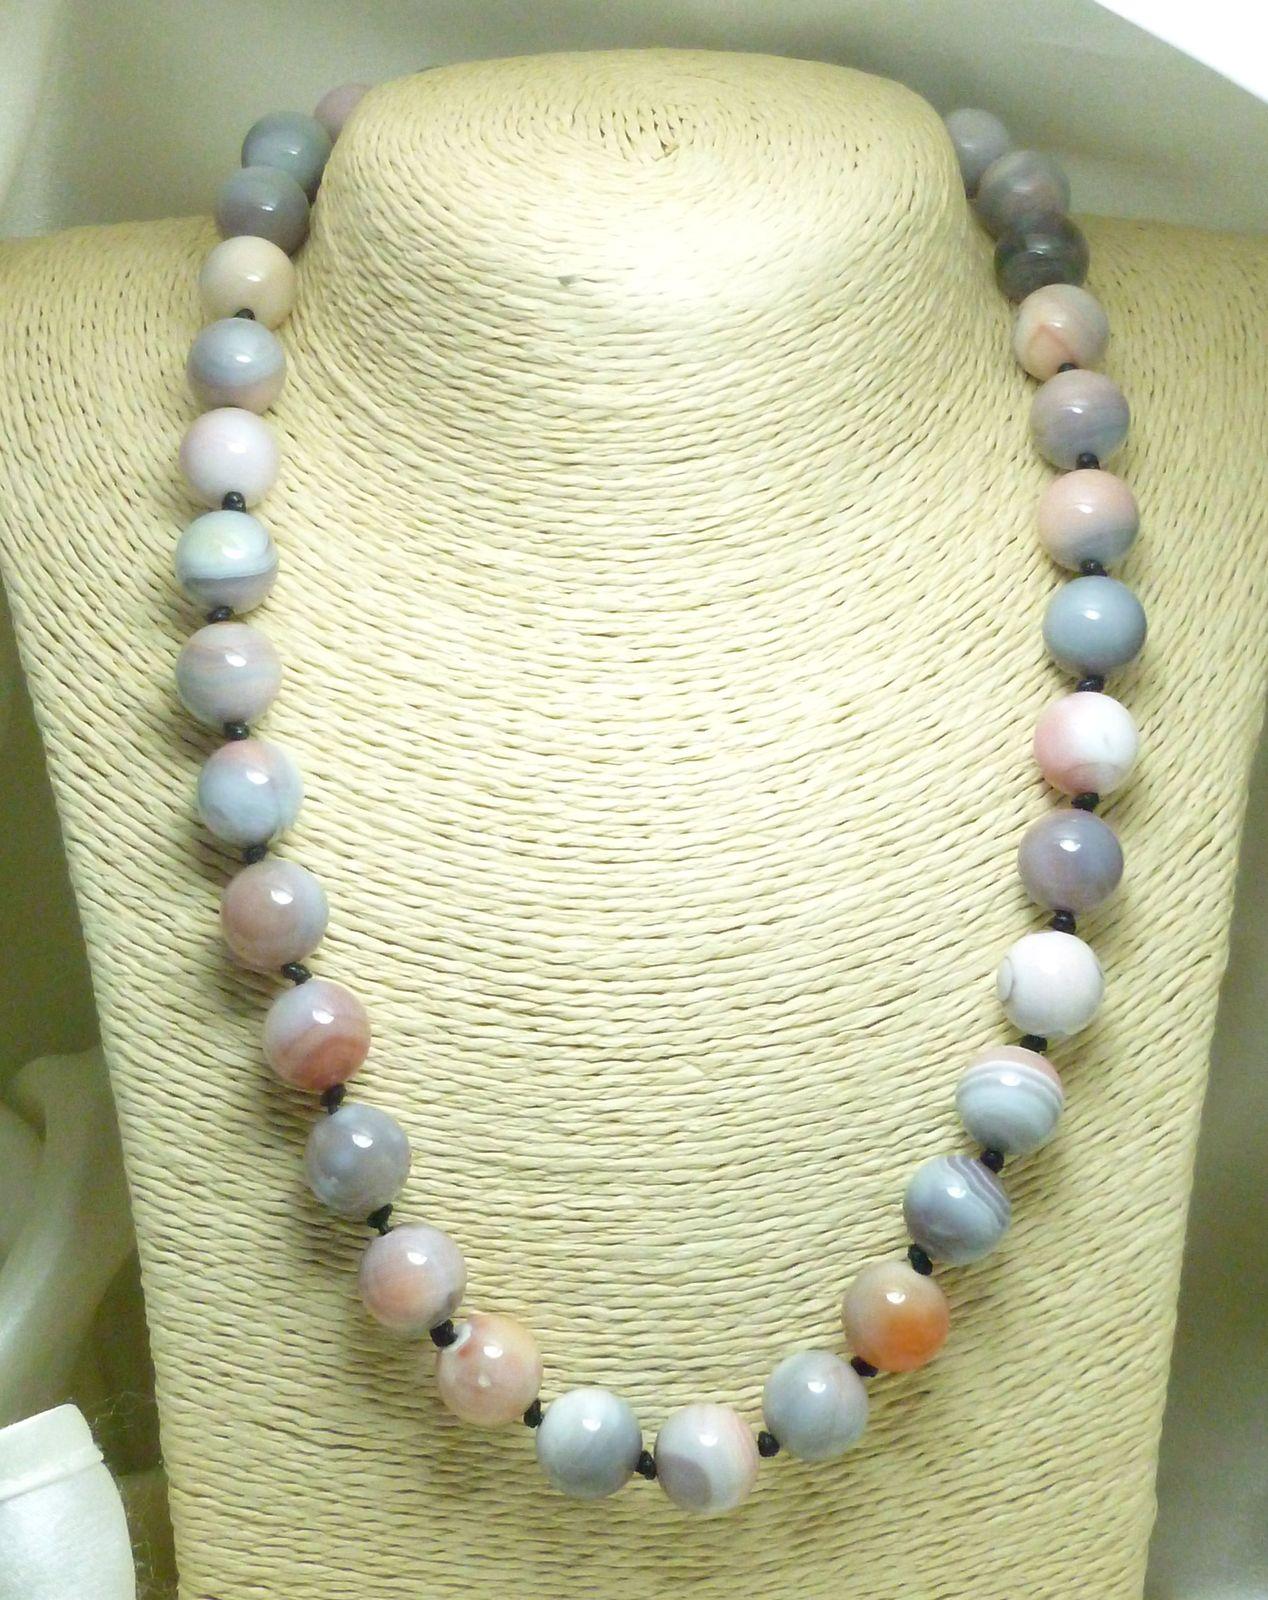 Pink Botswana Agate Gemstone Round Beaded Necklace 20 inch